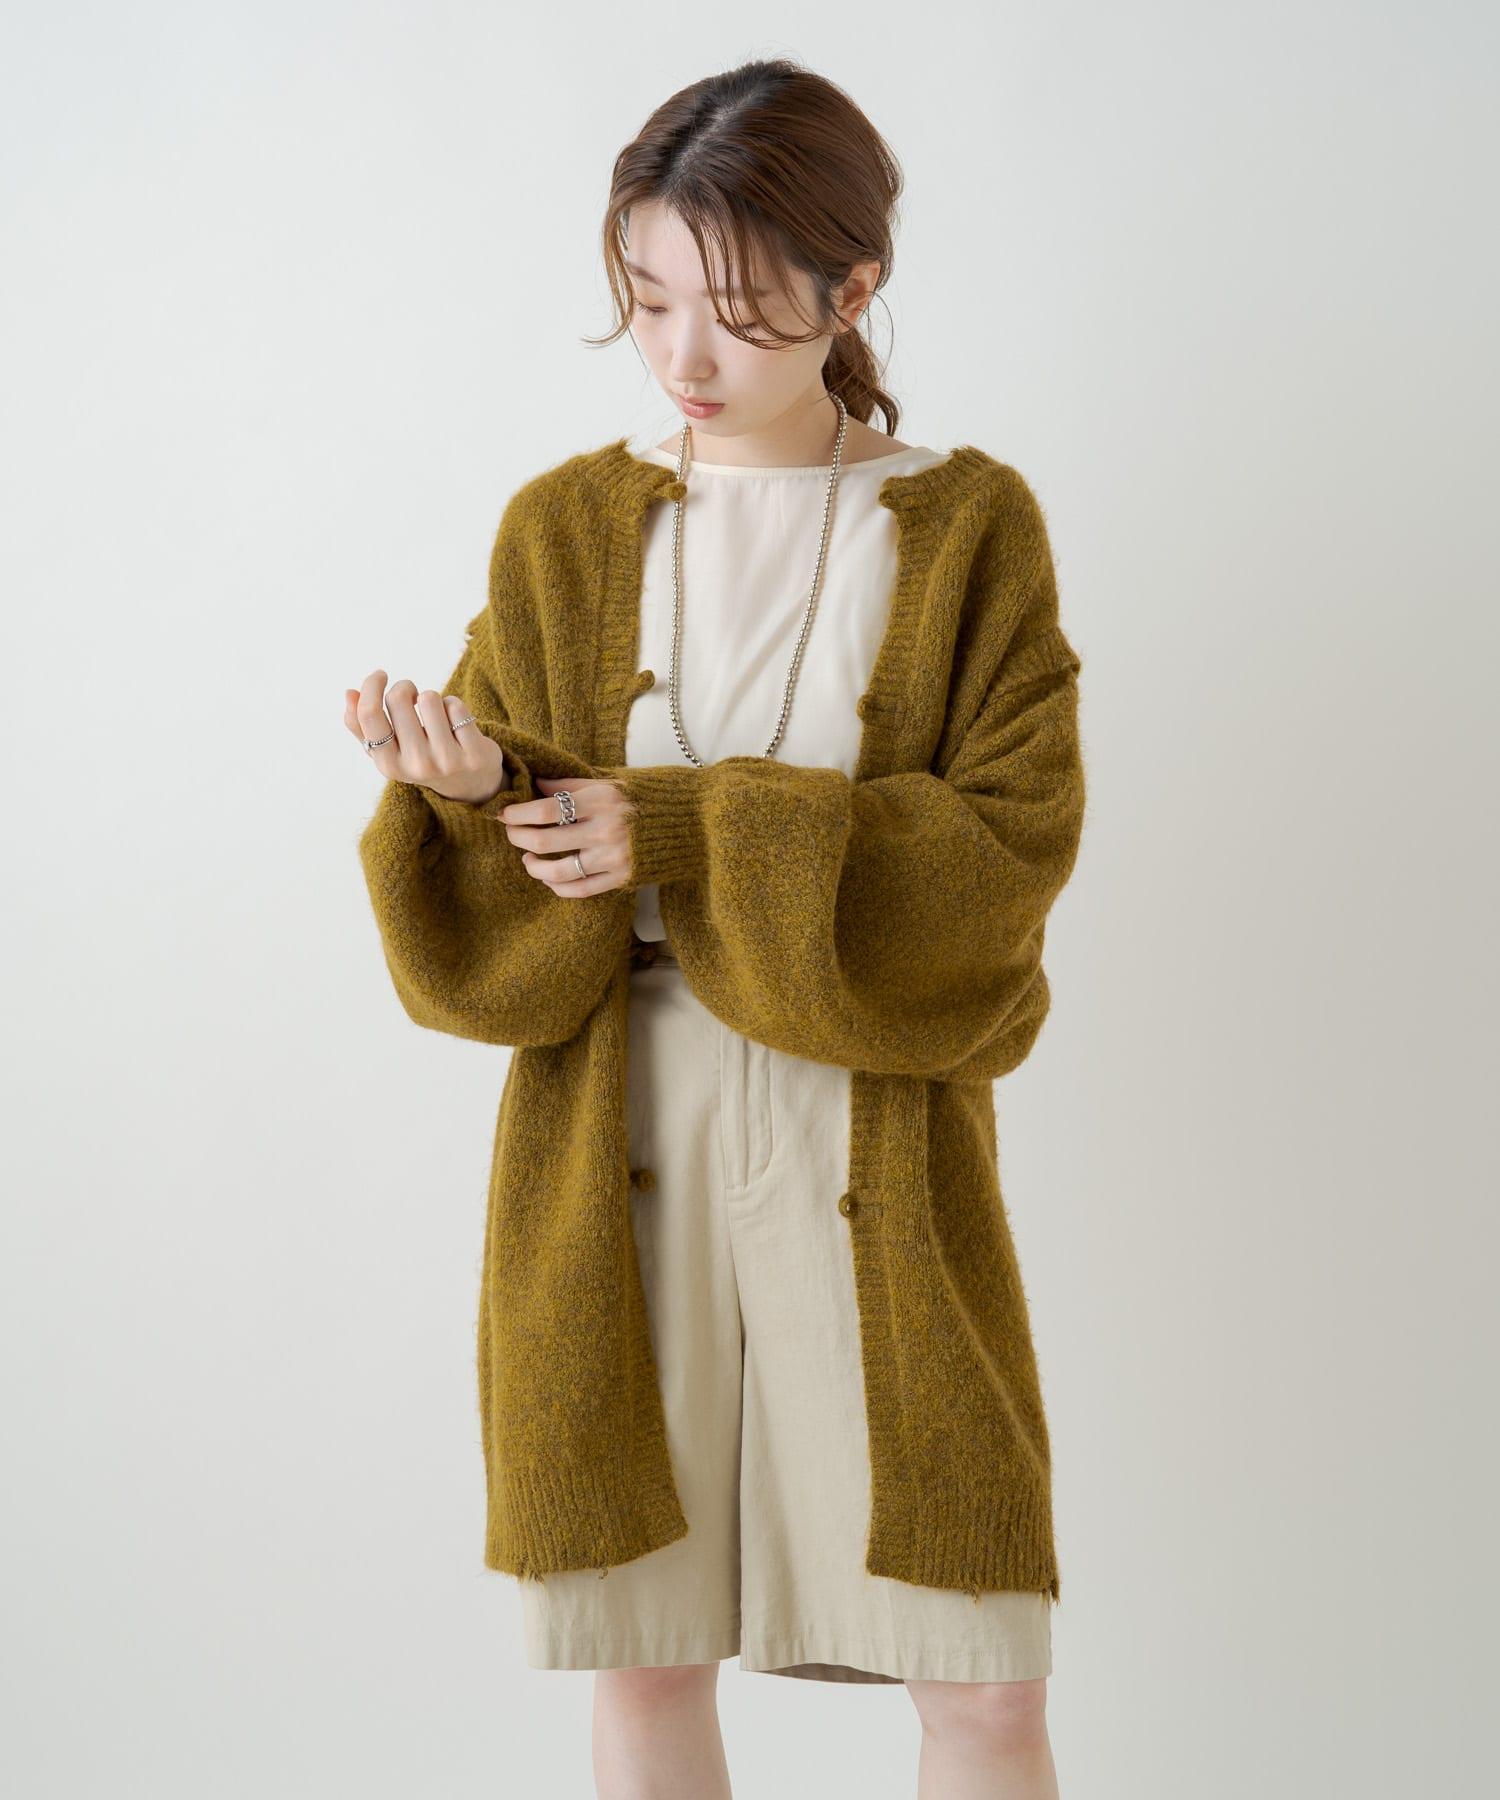 Kastane(カスタネ) レイヤード風2WAYダメージニット